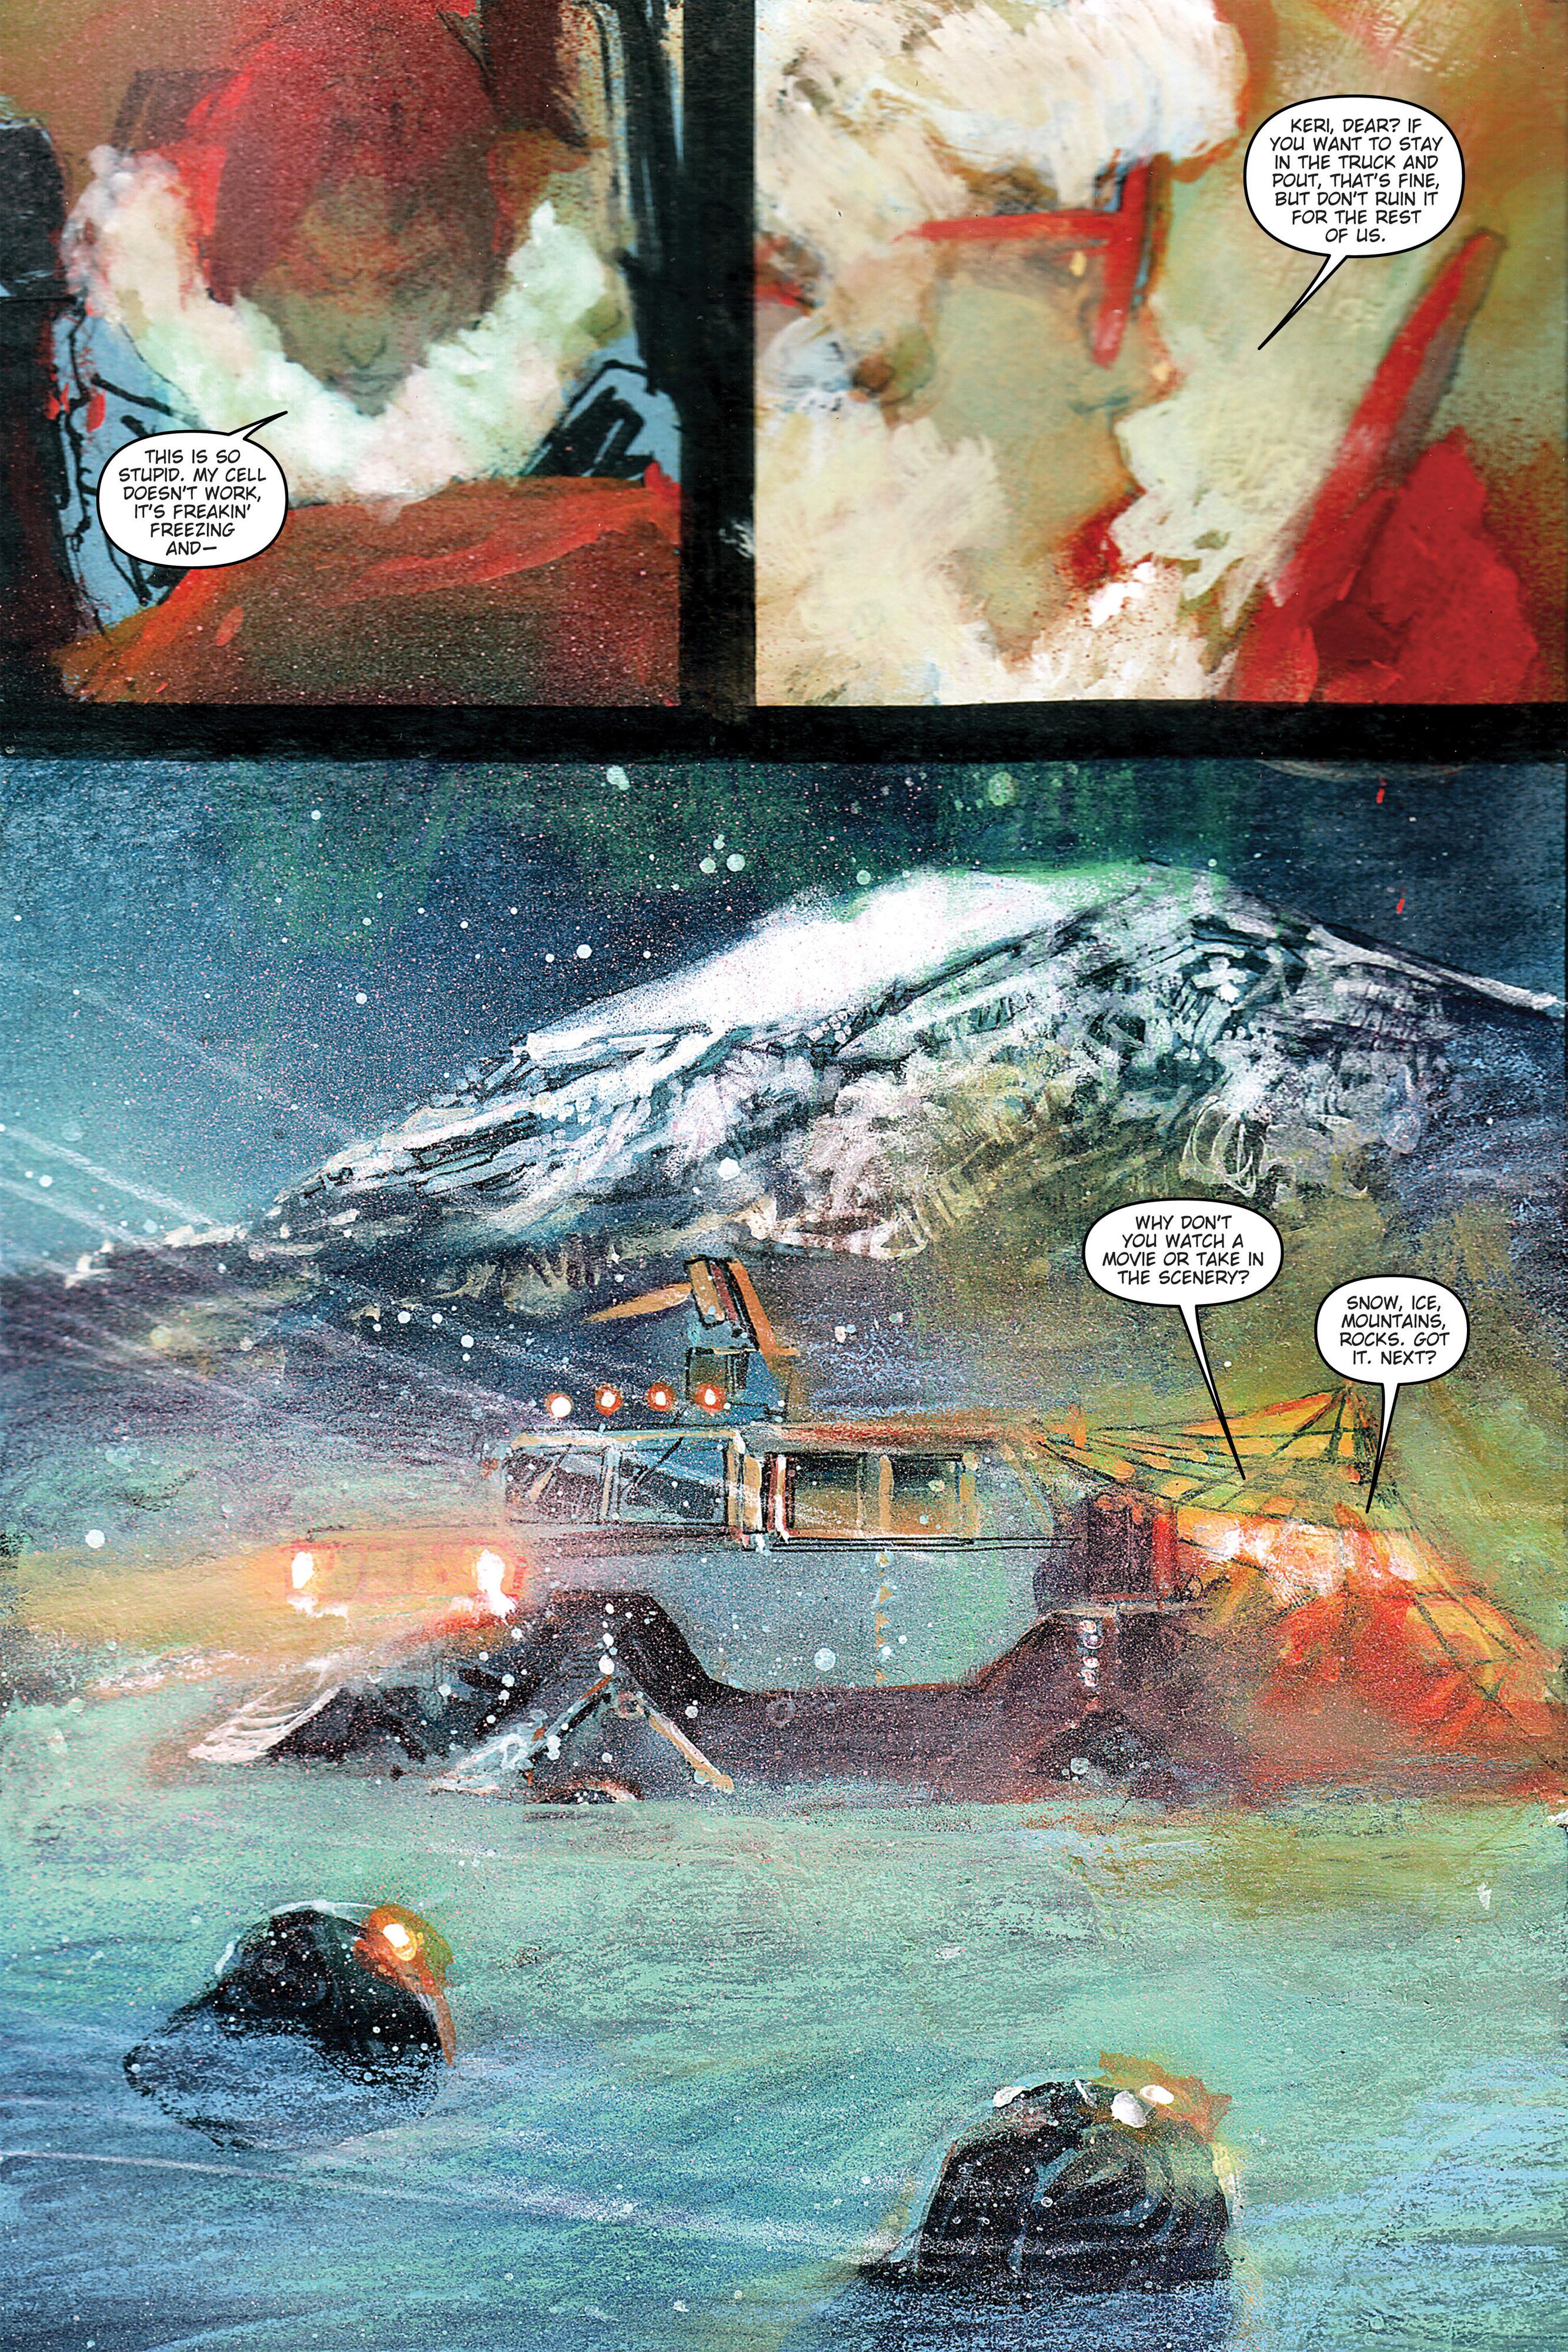 30 Days of Night: Beyond Barrow 2 Page 7